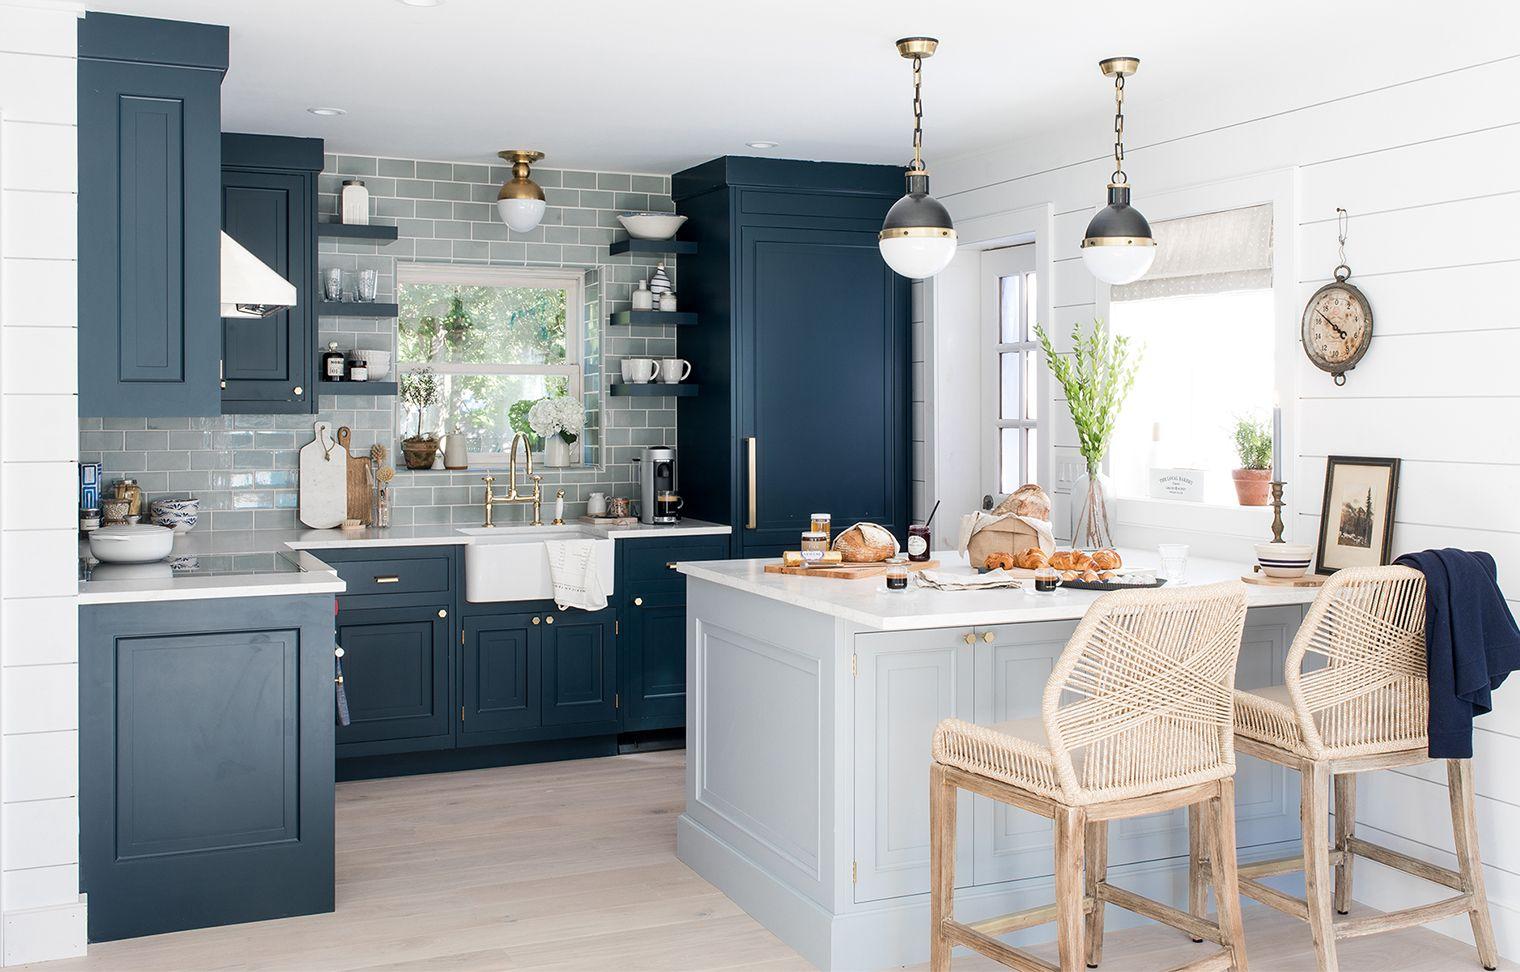 Kitchen Design White And Blue Buyfresh Store Buyfresh Store